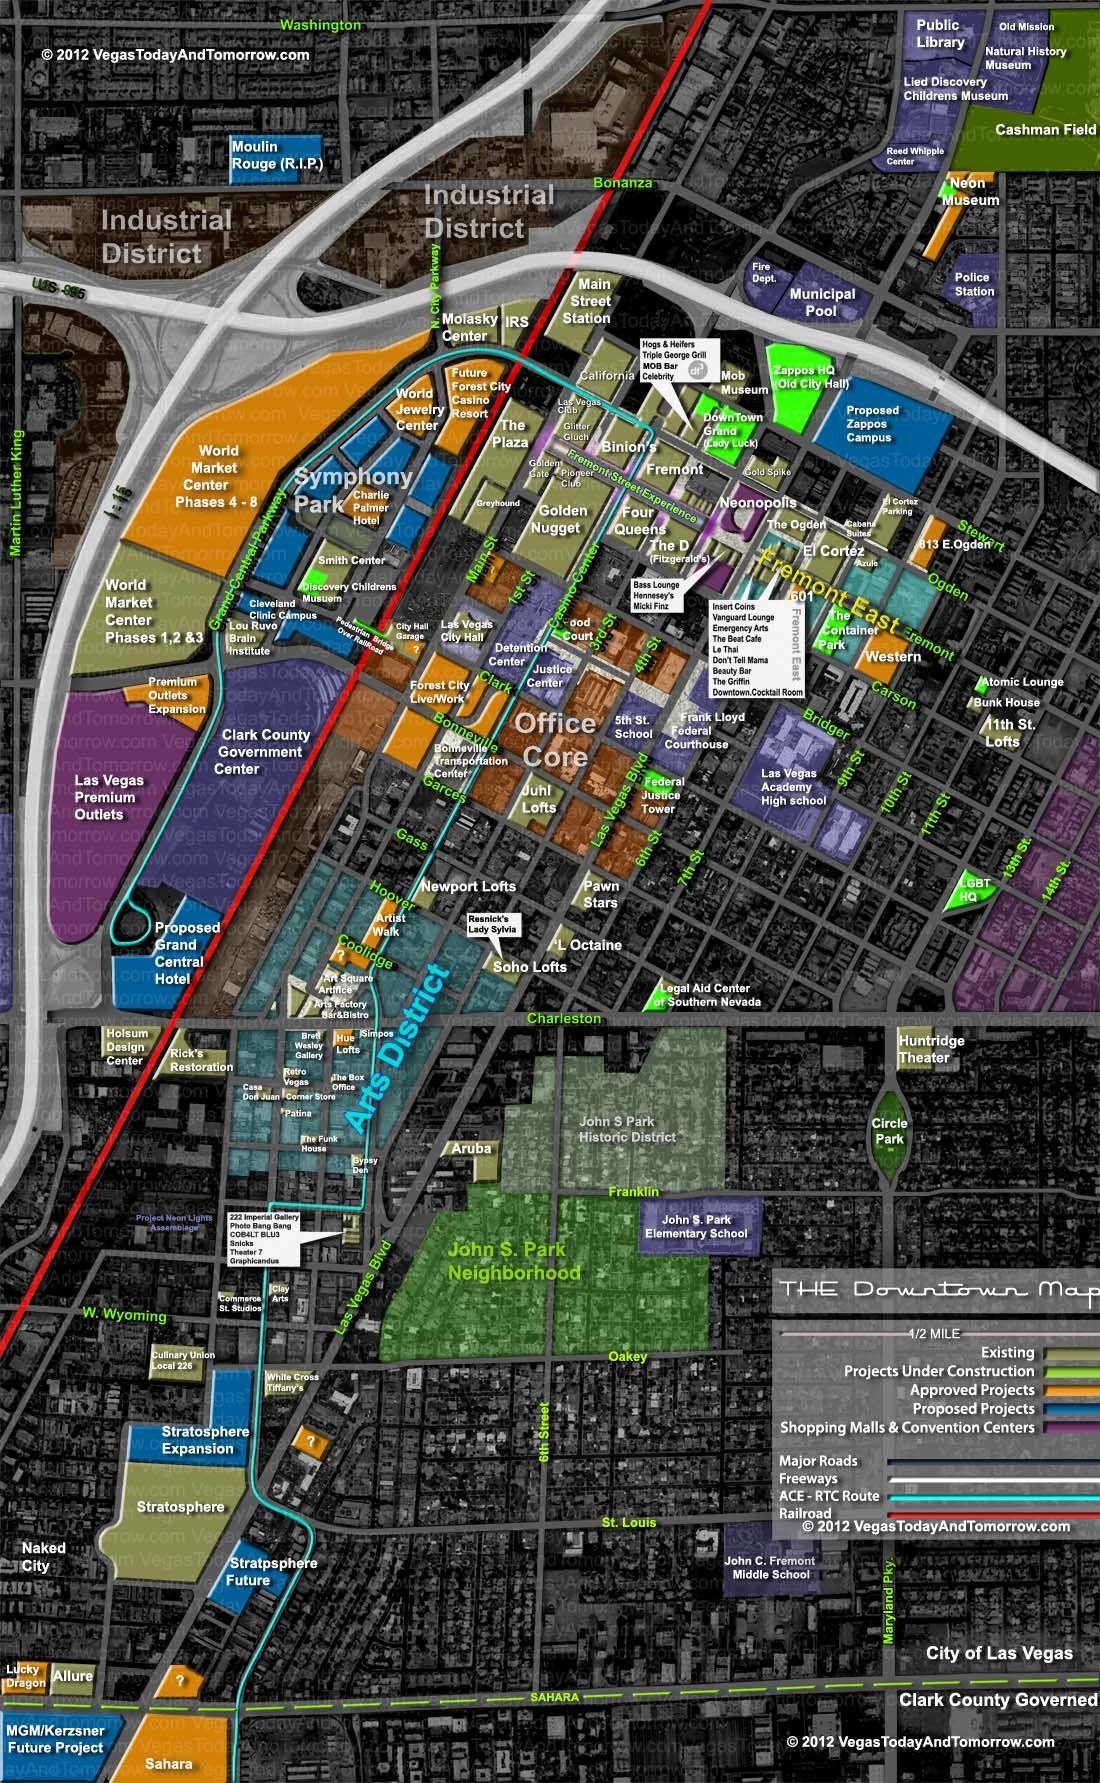 THE Downtown Vegas Nevada Map | Las vegas trip, Nevada map ... on mandalay bay floor map, fremont map, suez canal africa map, beijing downtown map, downtown sarasota hotels, phoenix arizona map, downtown salem map, downtown nashville map, oakland city center map, downtown chicago map, sam's town map, downtown reno map, downtown rome map, downtown phoenix zip code map, downtown boston map, downtown ogden ut, downtown fargo map, downtown texas map, henderson map, downtown paris map,